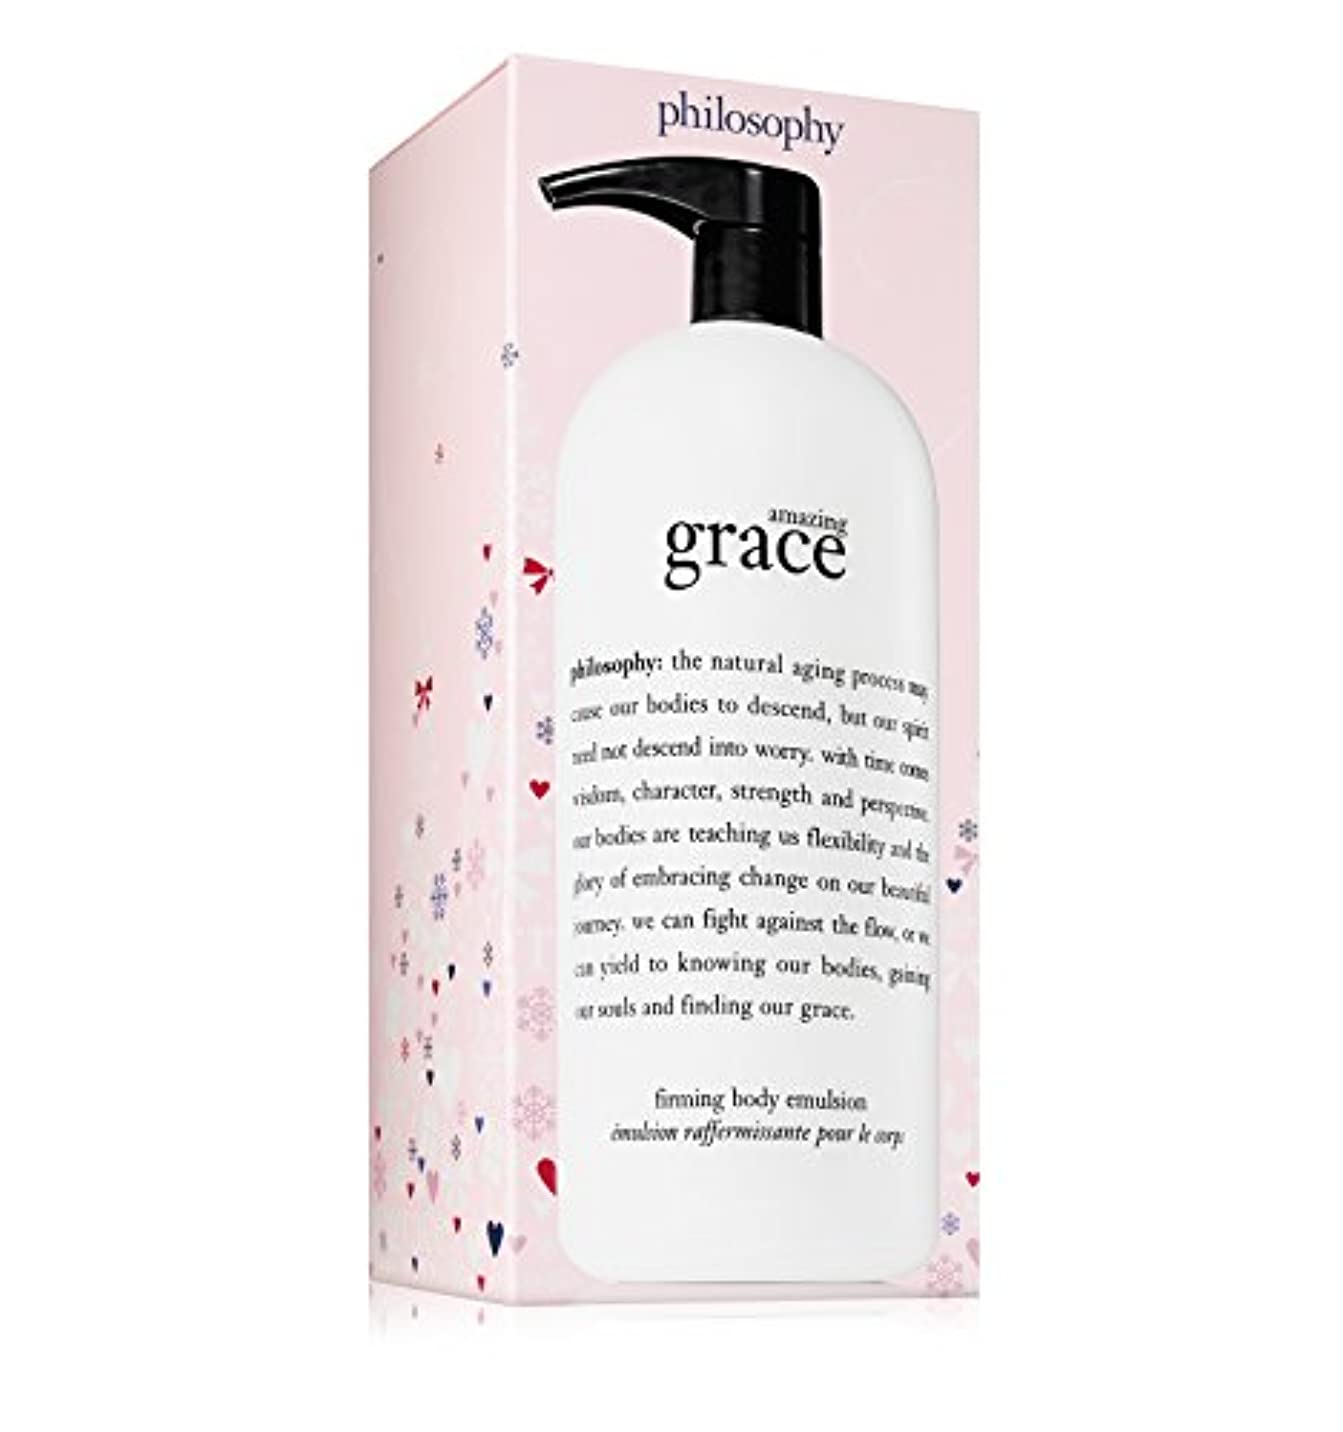 Philosophy - Amazing Grace Firming Body Emulsion Jumbo Limited Edition Holiday 2017